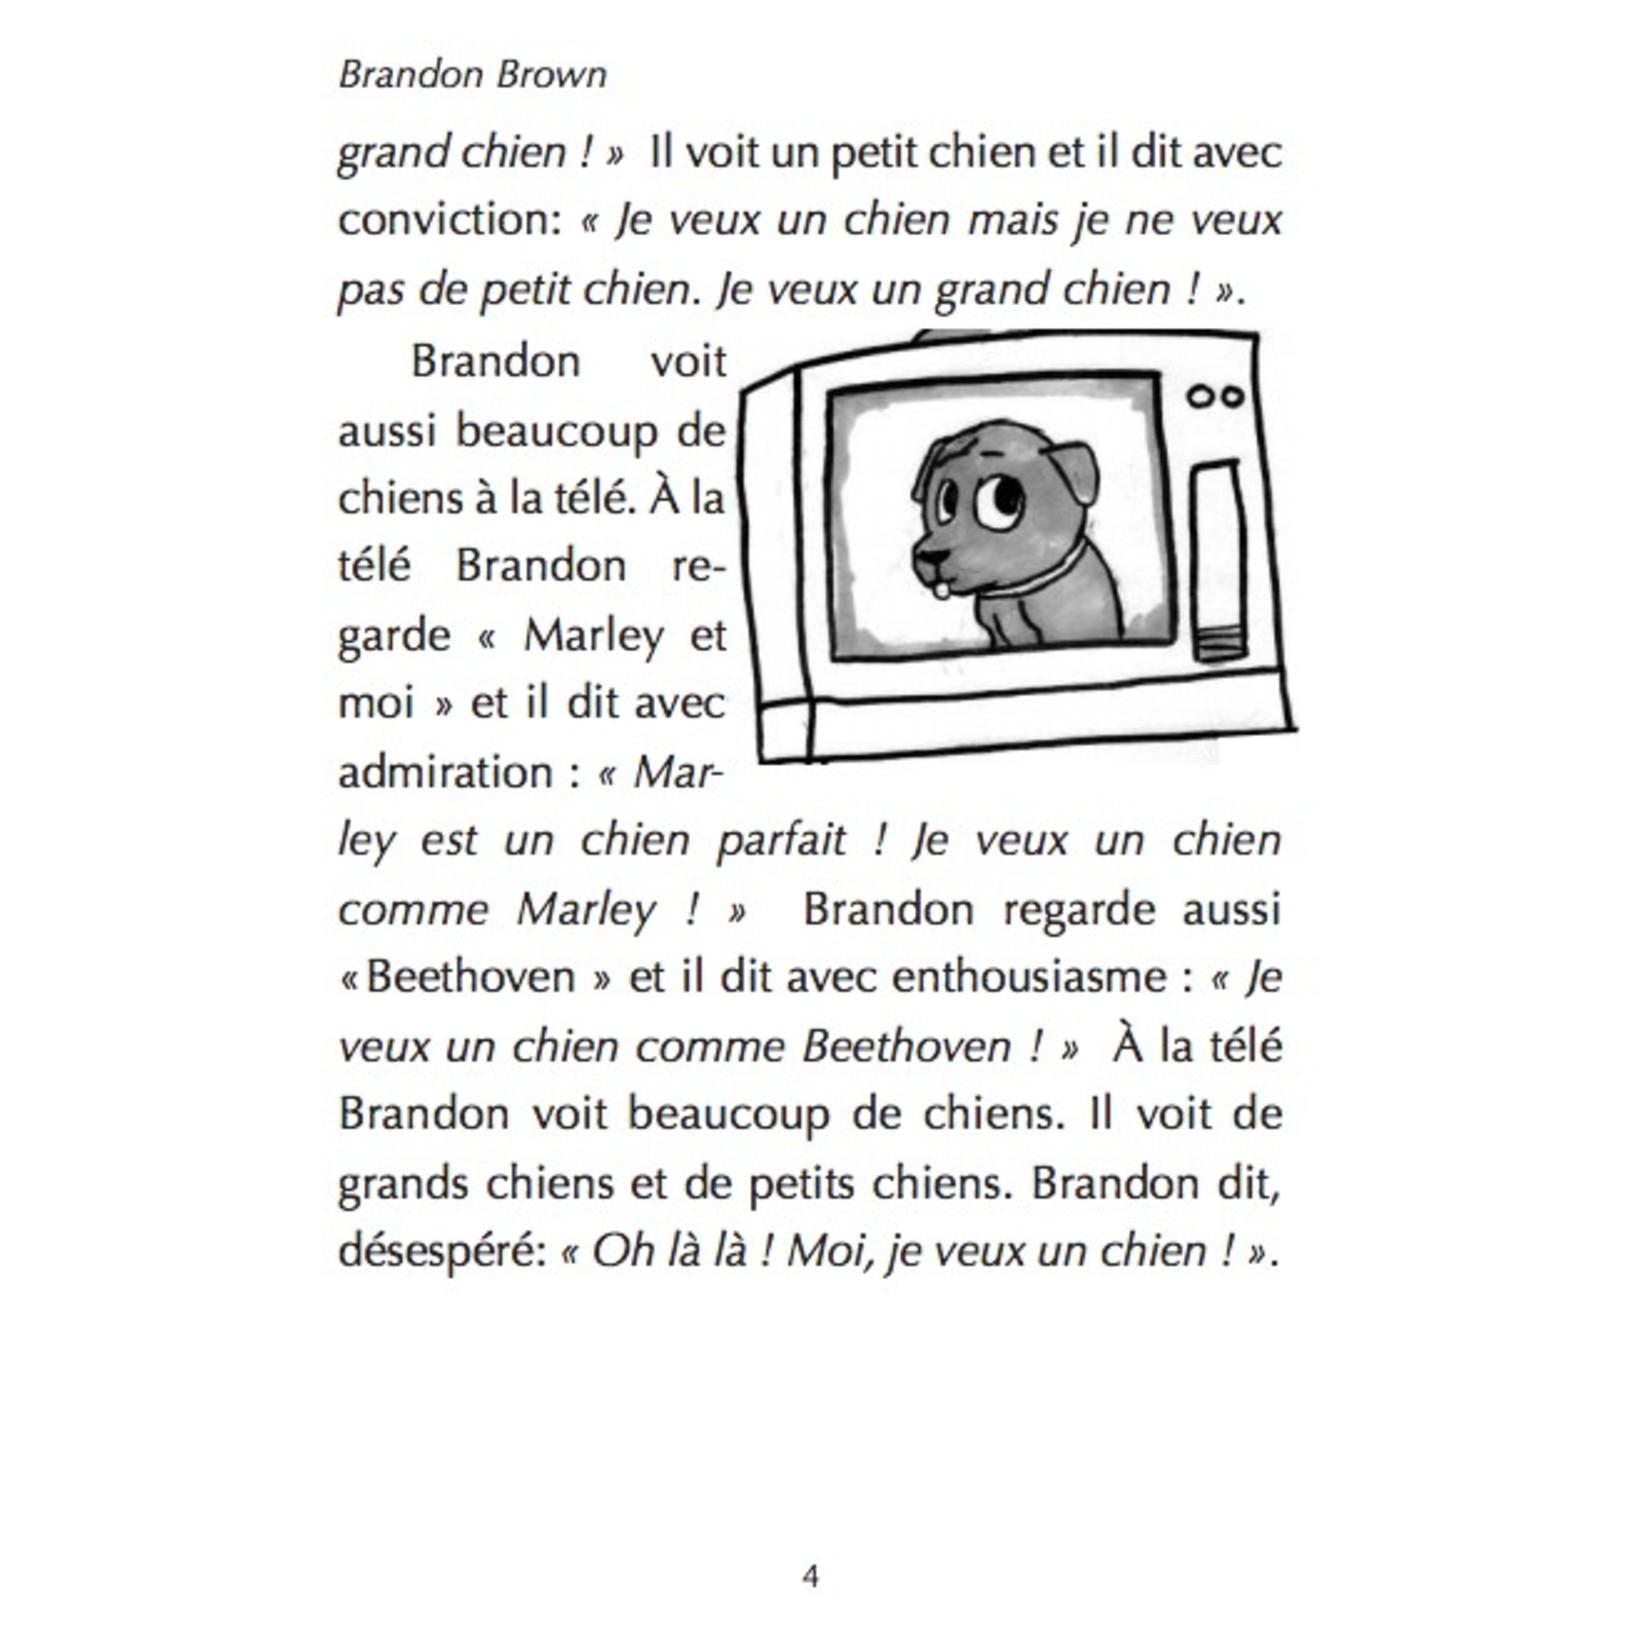 Fluency Matters Brandon Brown veut un chien